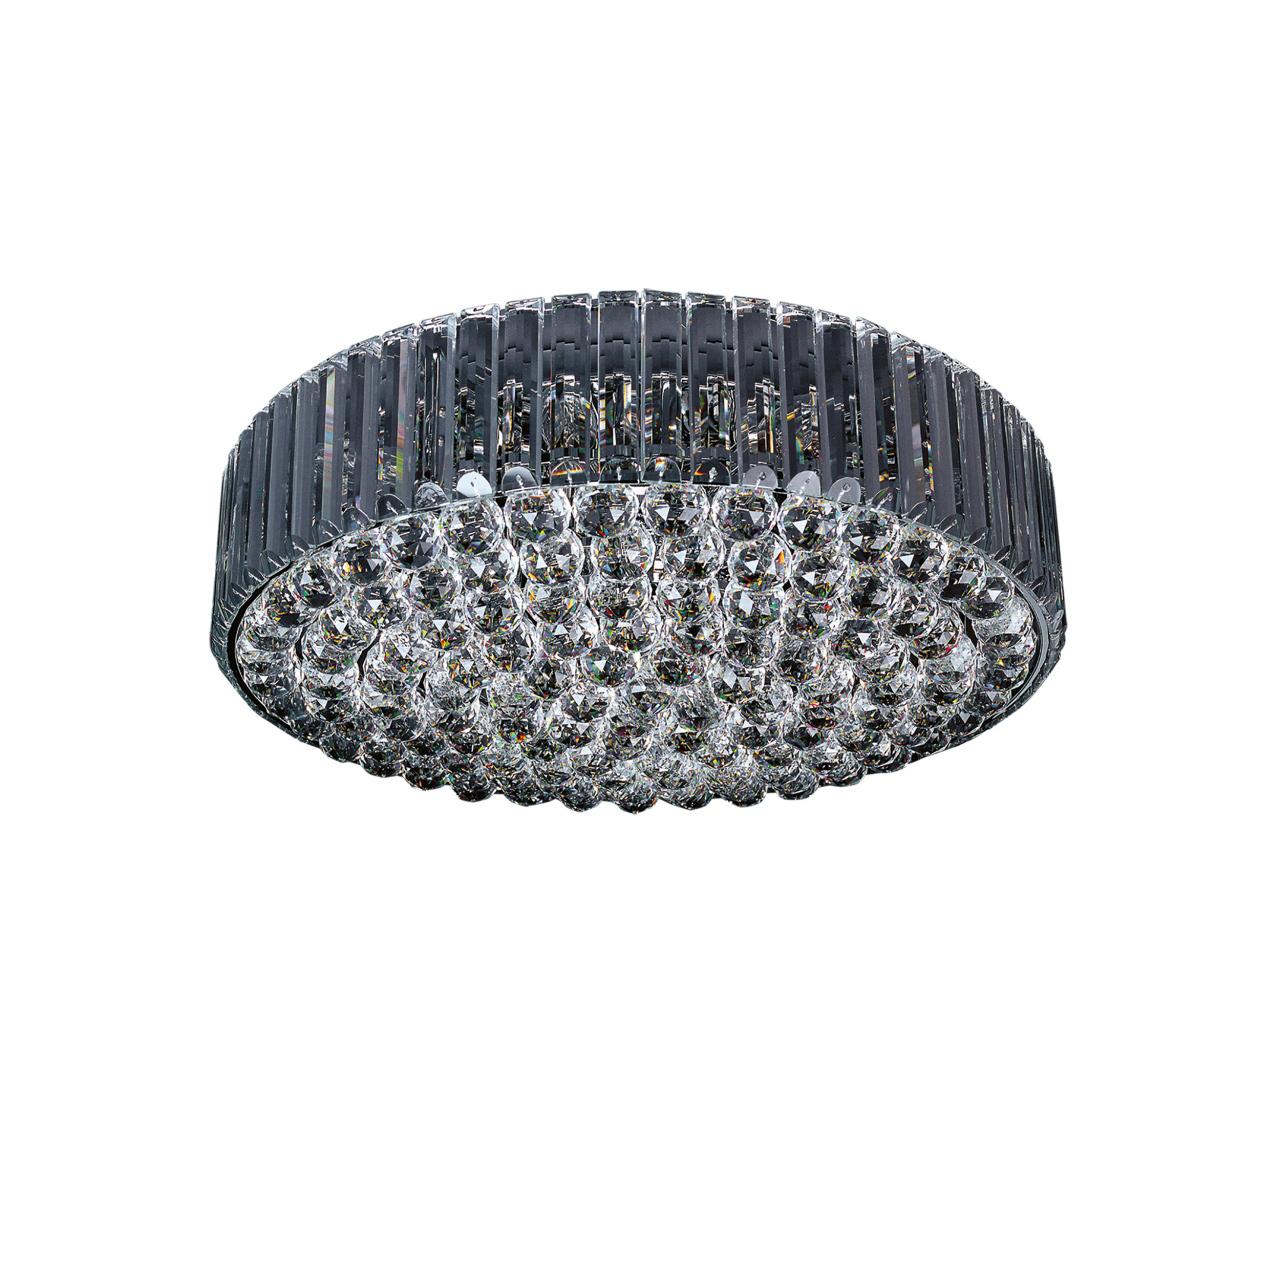 Люстра потолочная Regolo 15х60W E14 хром Osgona 713154